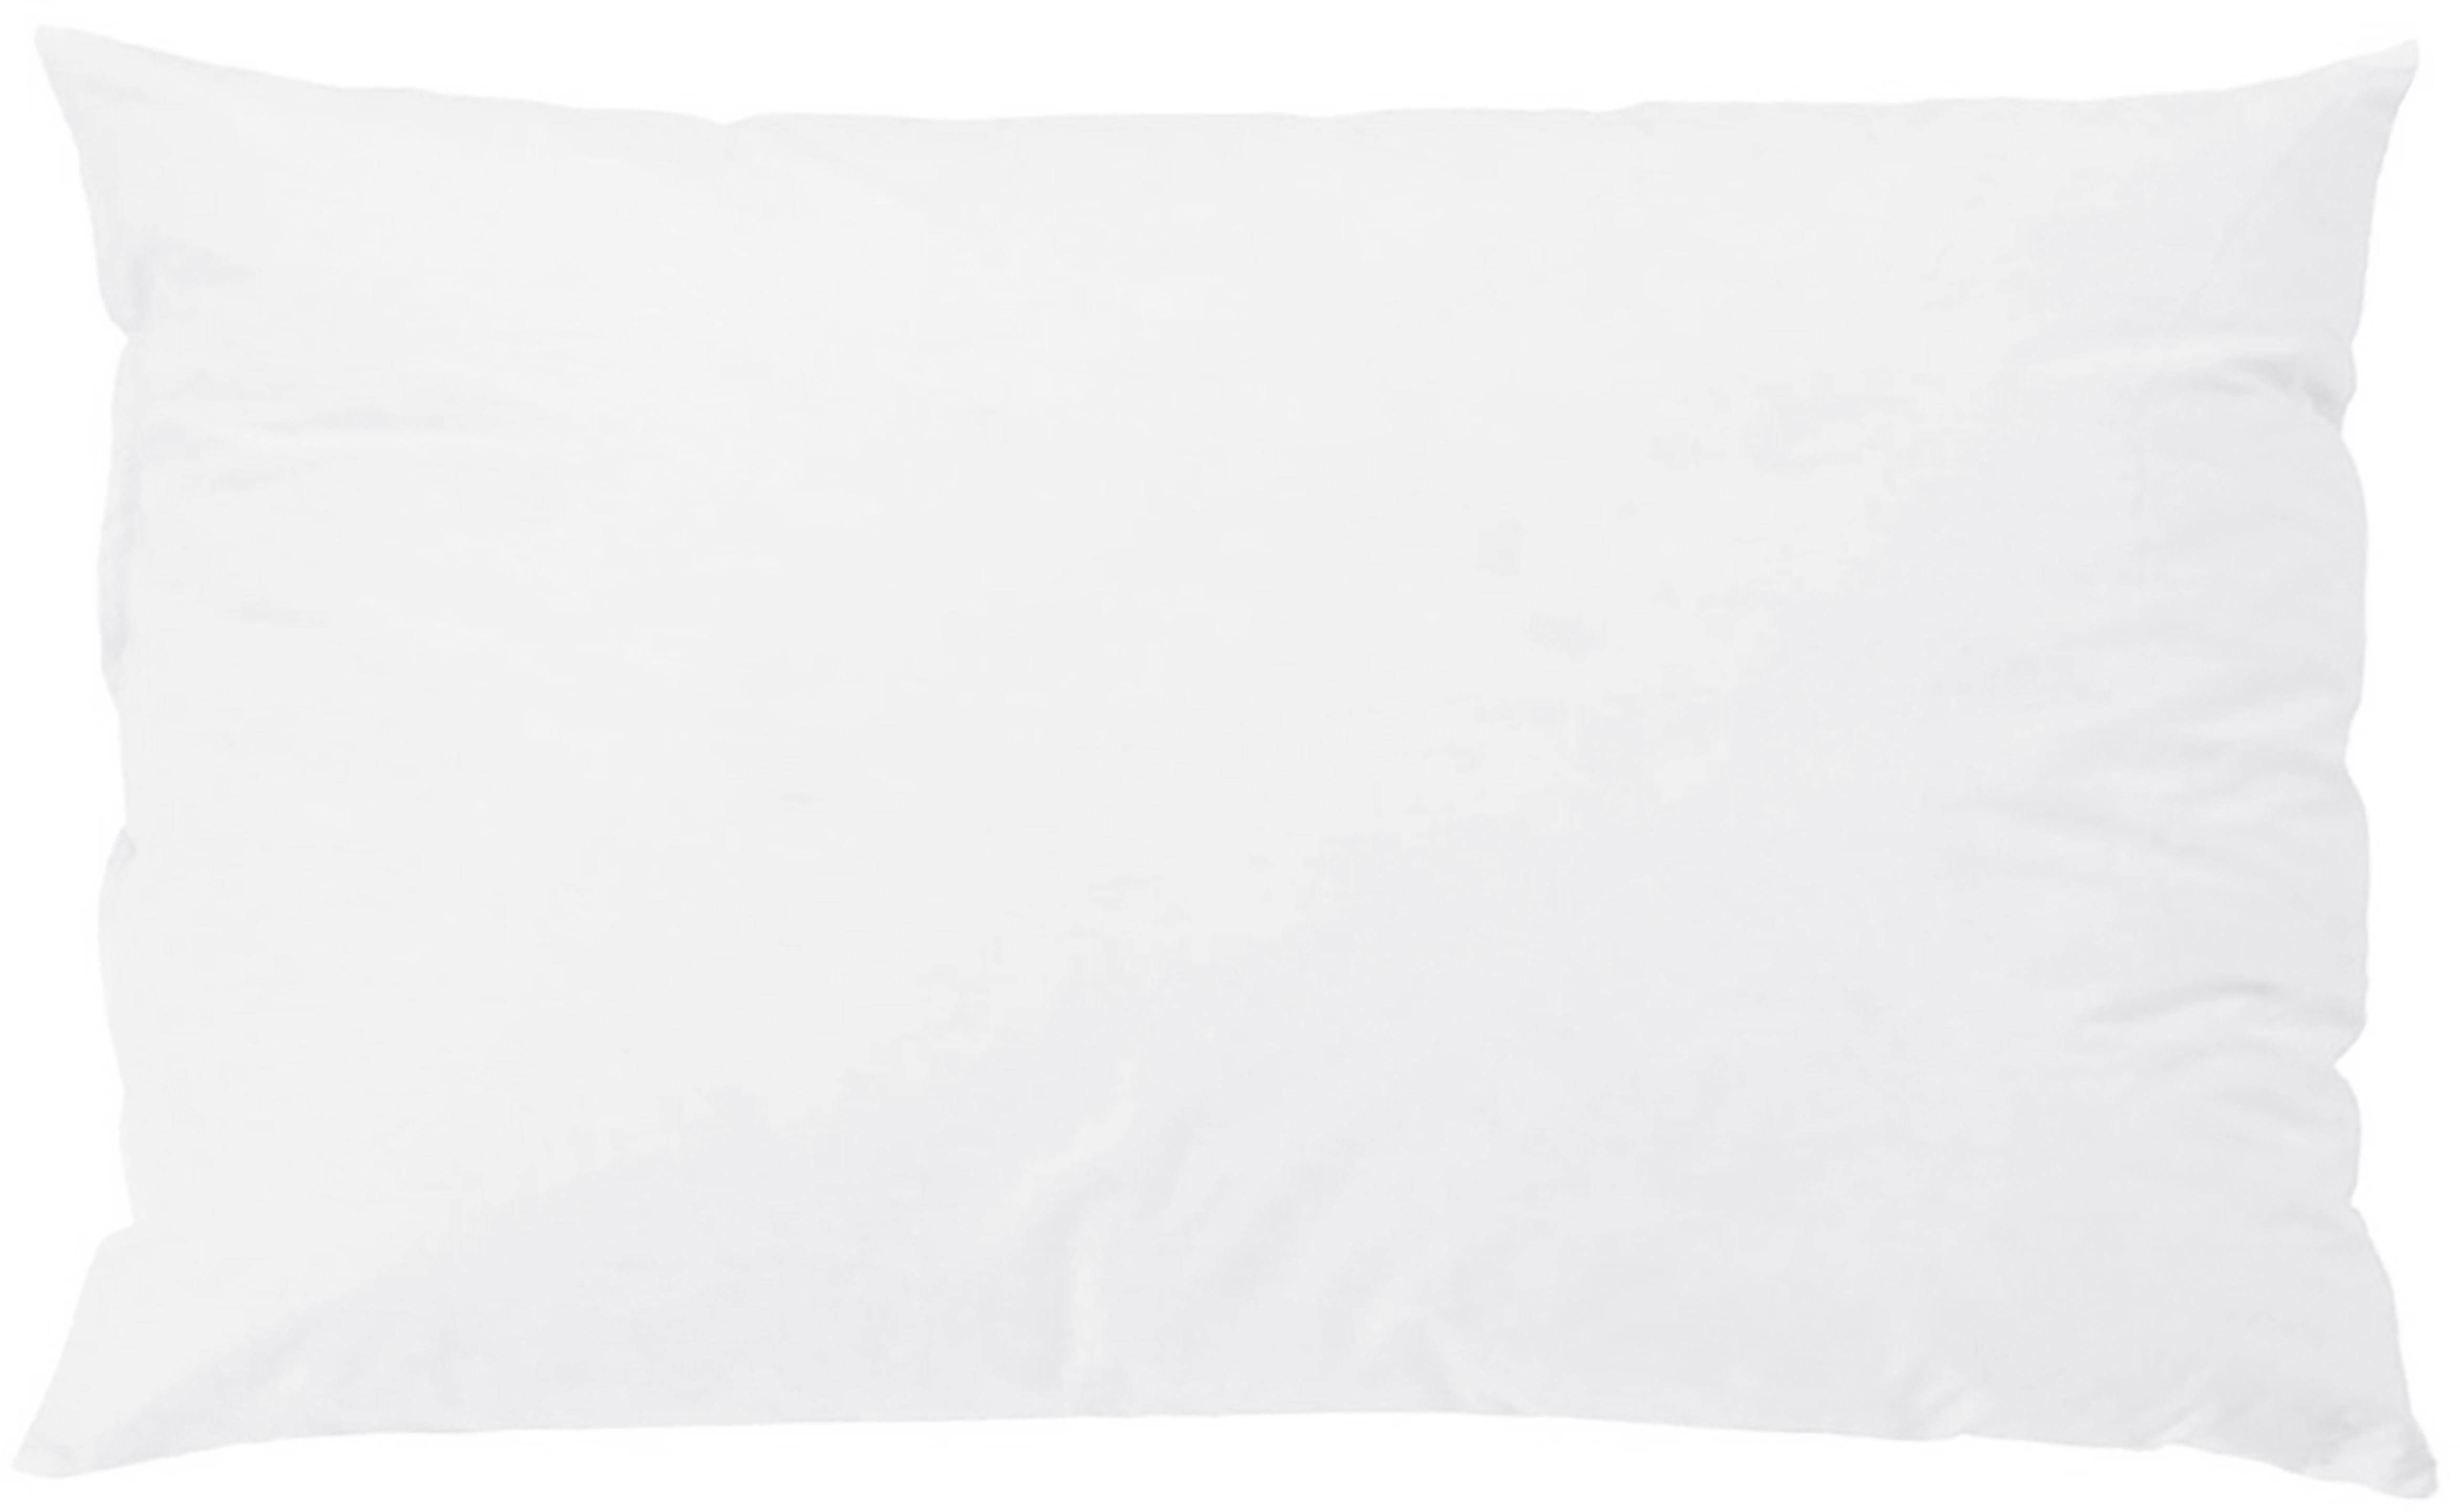 Relleno de cojín Premium, 30x50, Funda: percal Mako, 100%algodón, Blanco, An 30 x L 50 cm